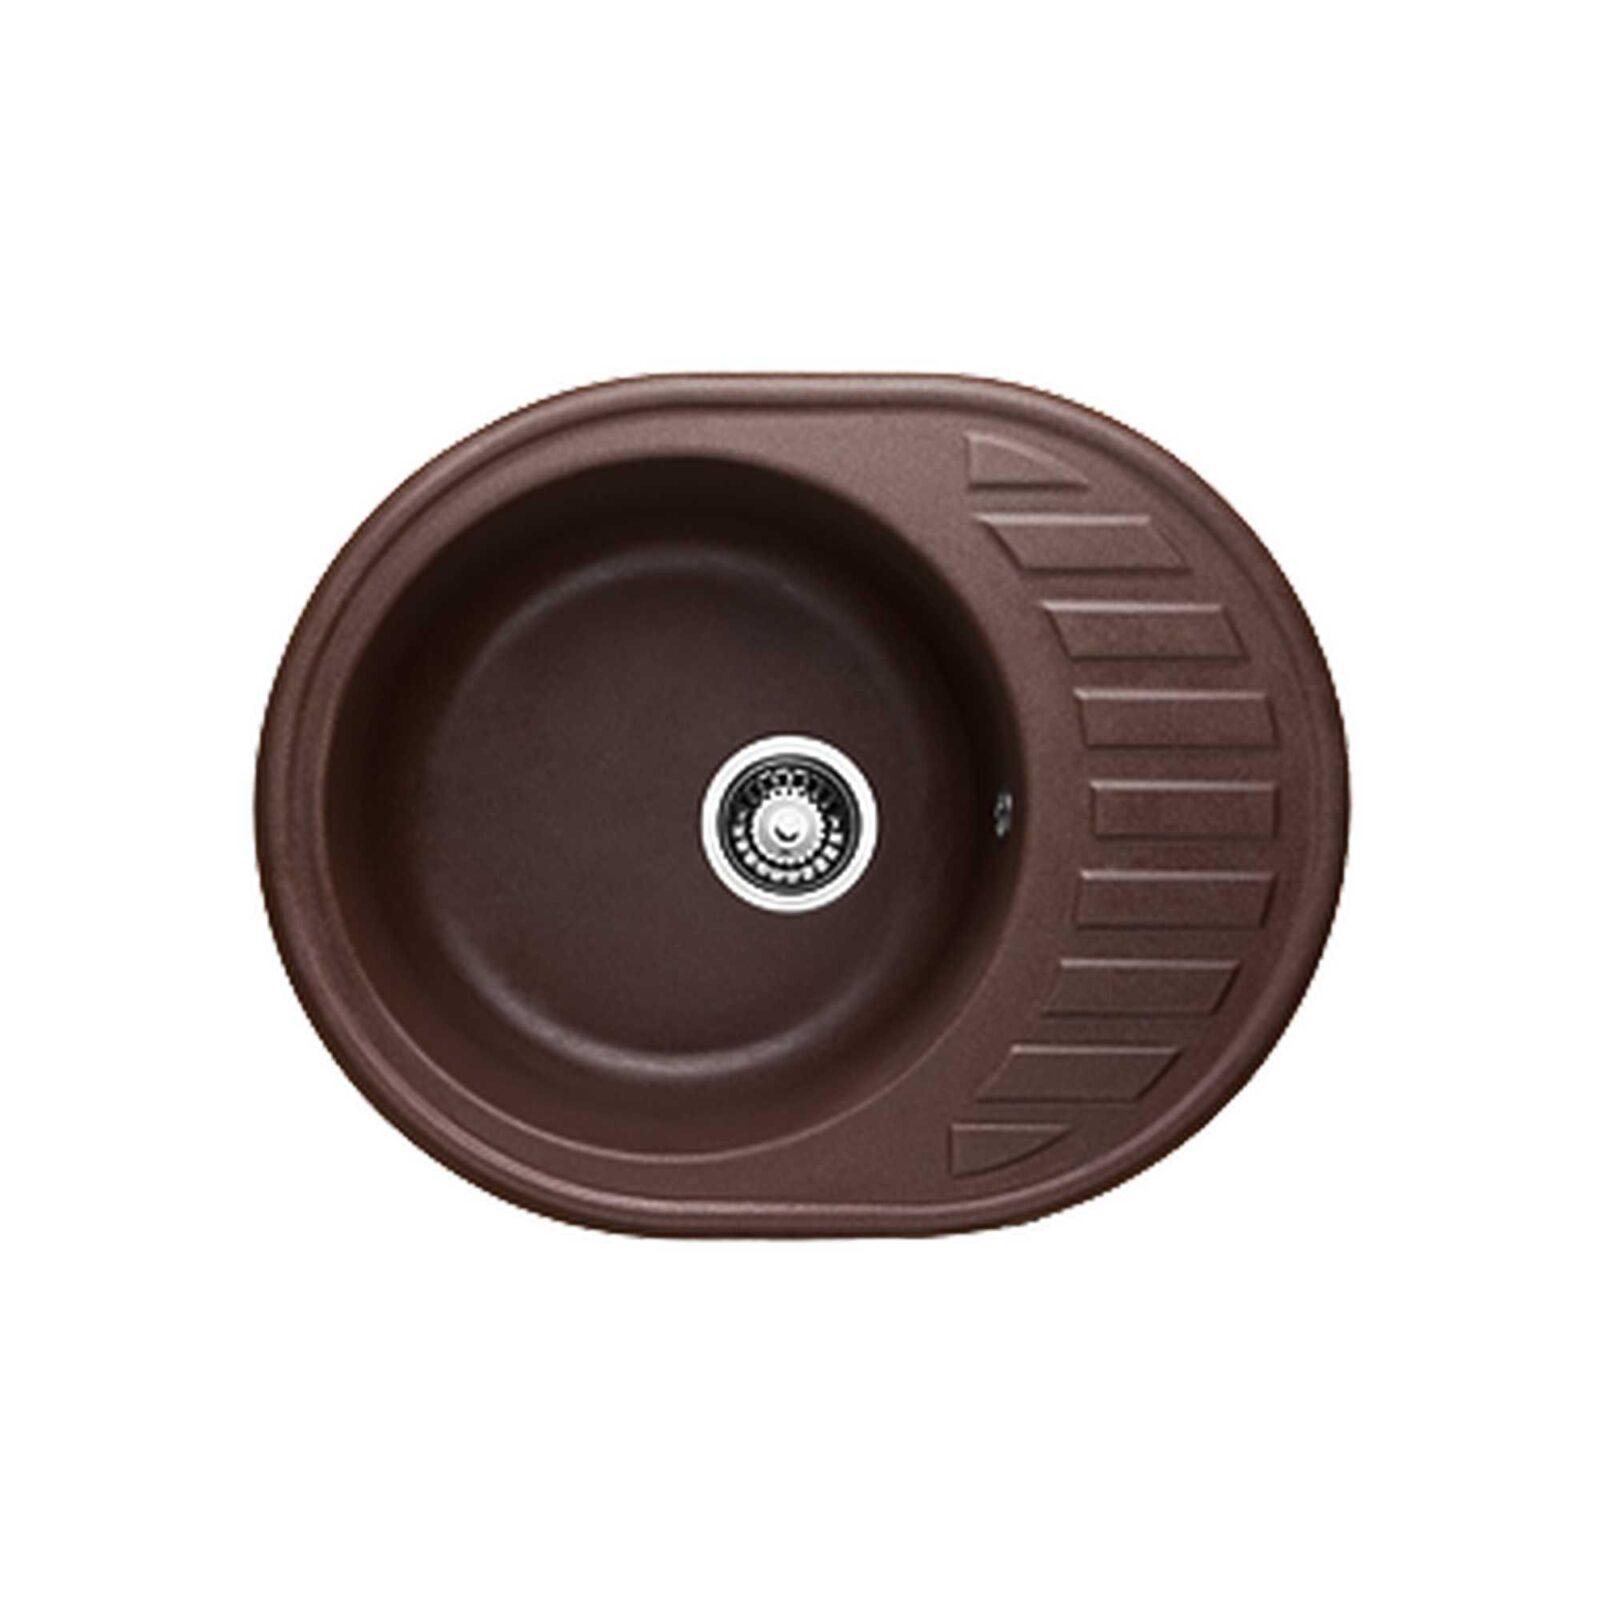 Мойка G-15(шоколад) (620х490х190) из гранитной крошки+сифон